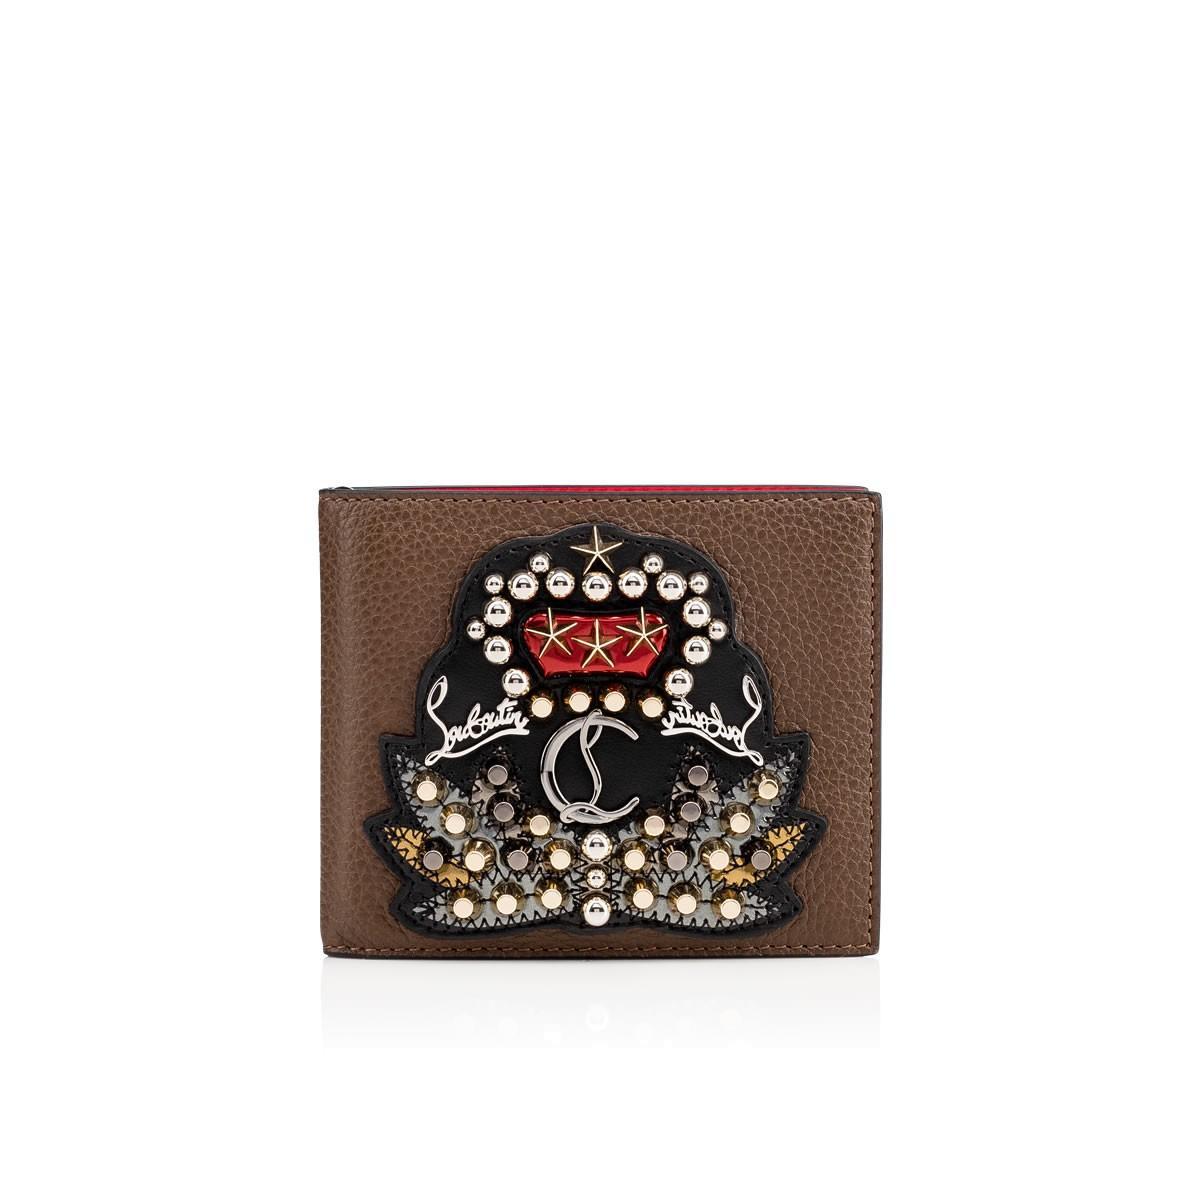 Christian Louboutin Kaspero Embellished Bi Fold Leather Wallet Mens Brown Multi In Cafe